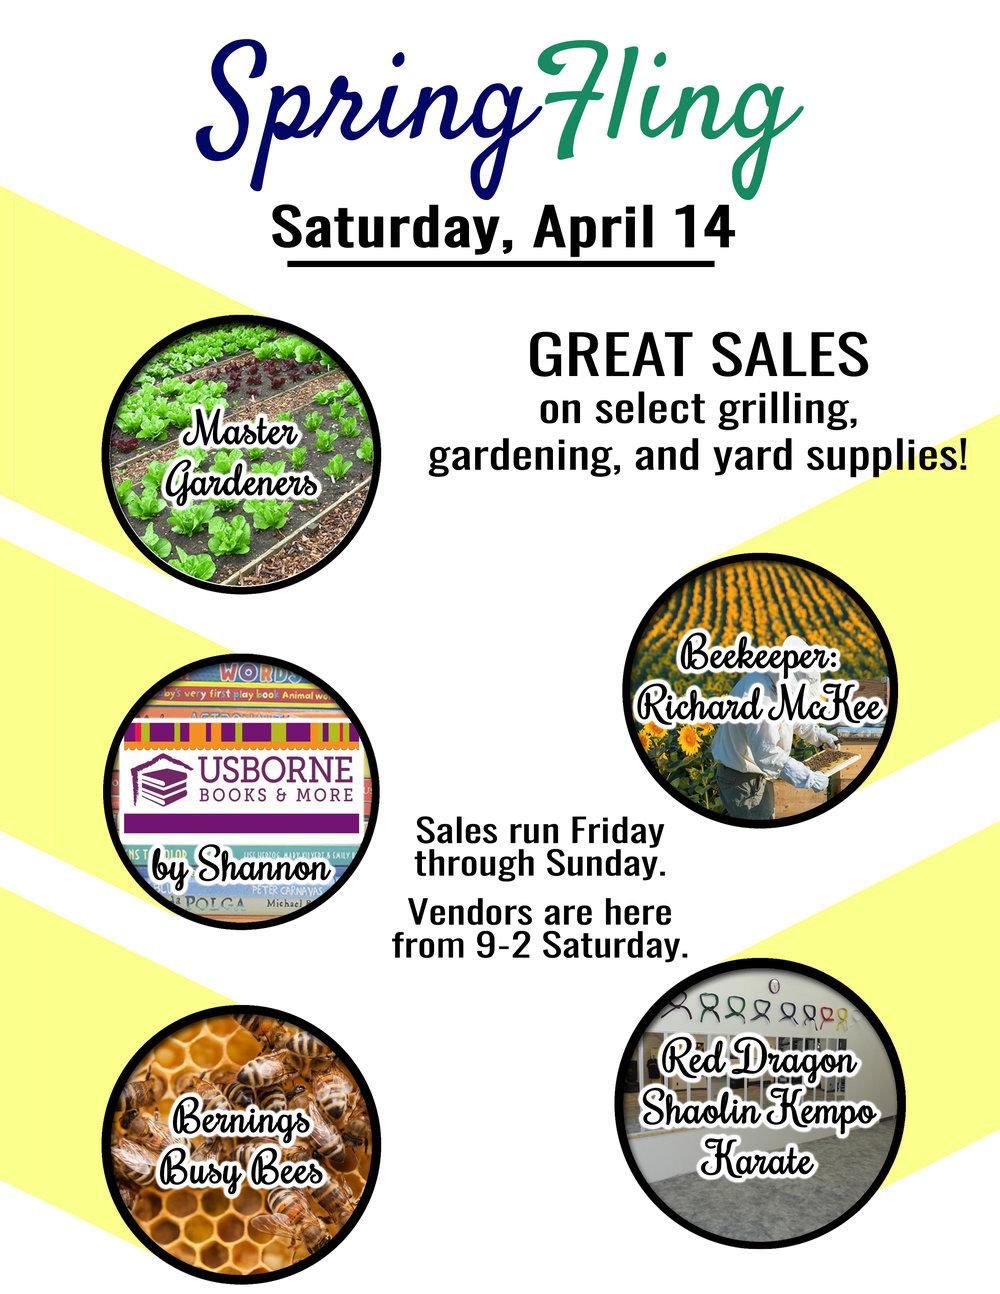 Portage Spring Fling has 5 great vendors!